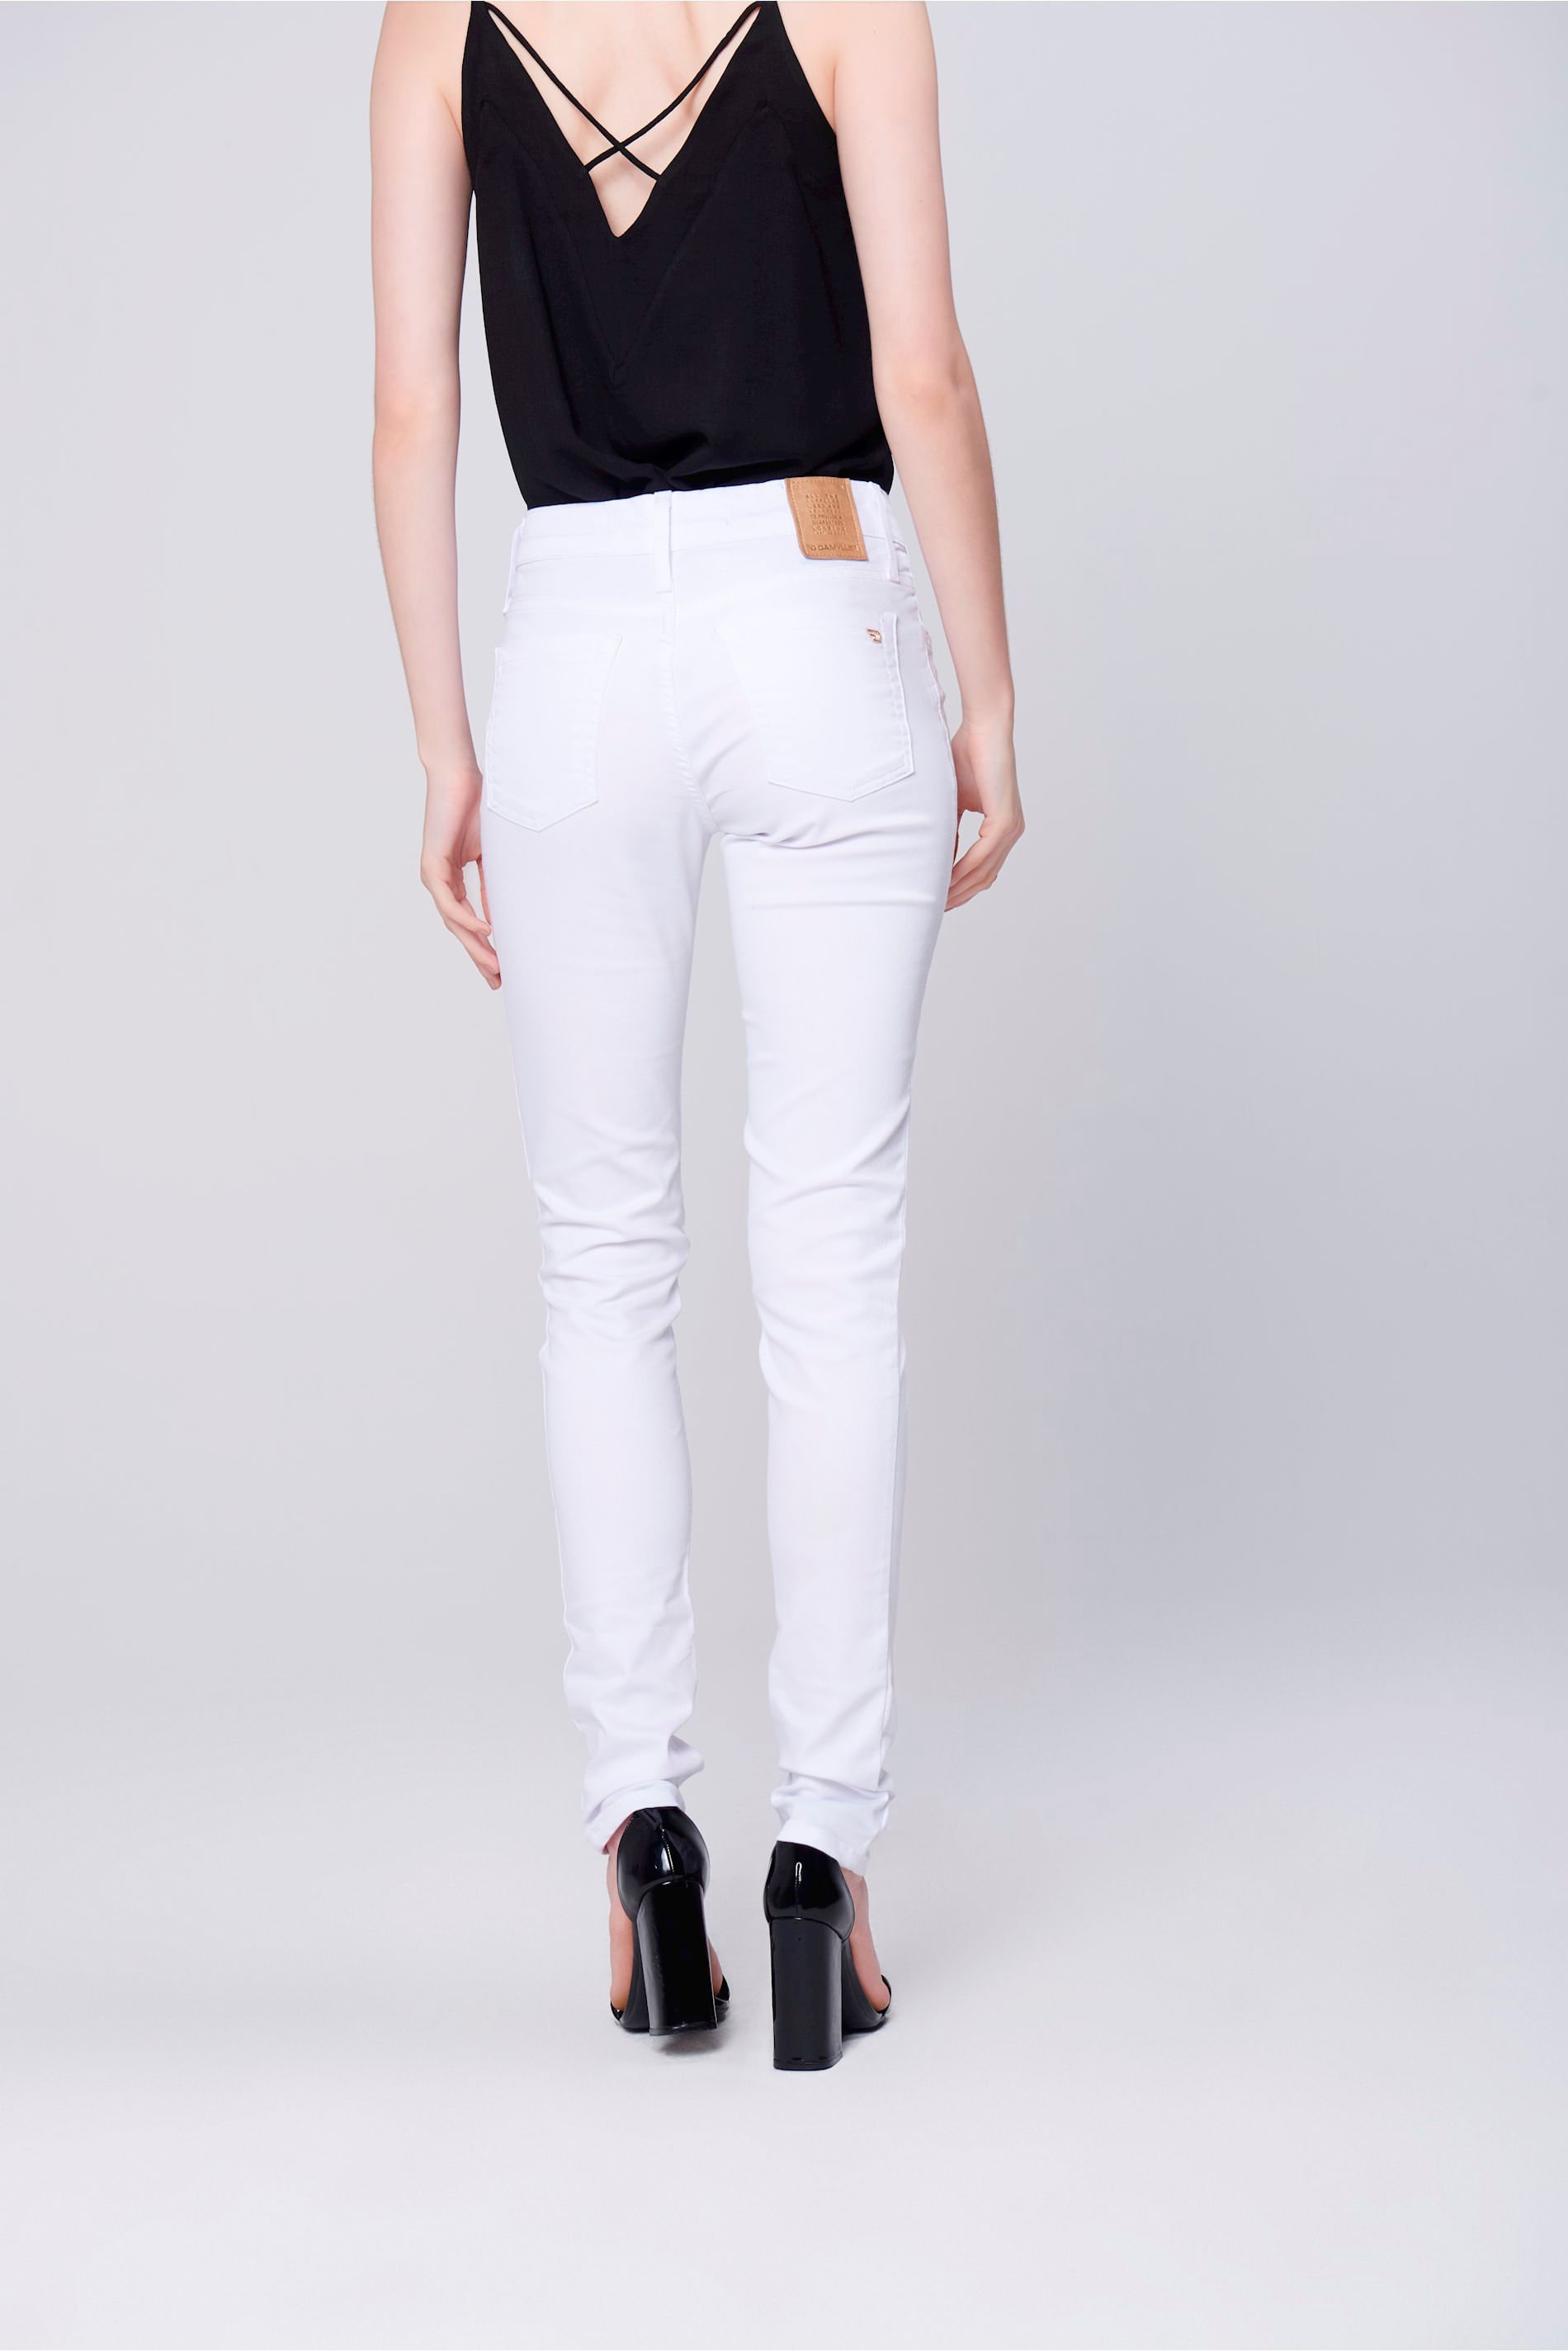 698a41bda Calça Skinny Branca Feminina - Damyller